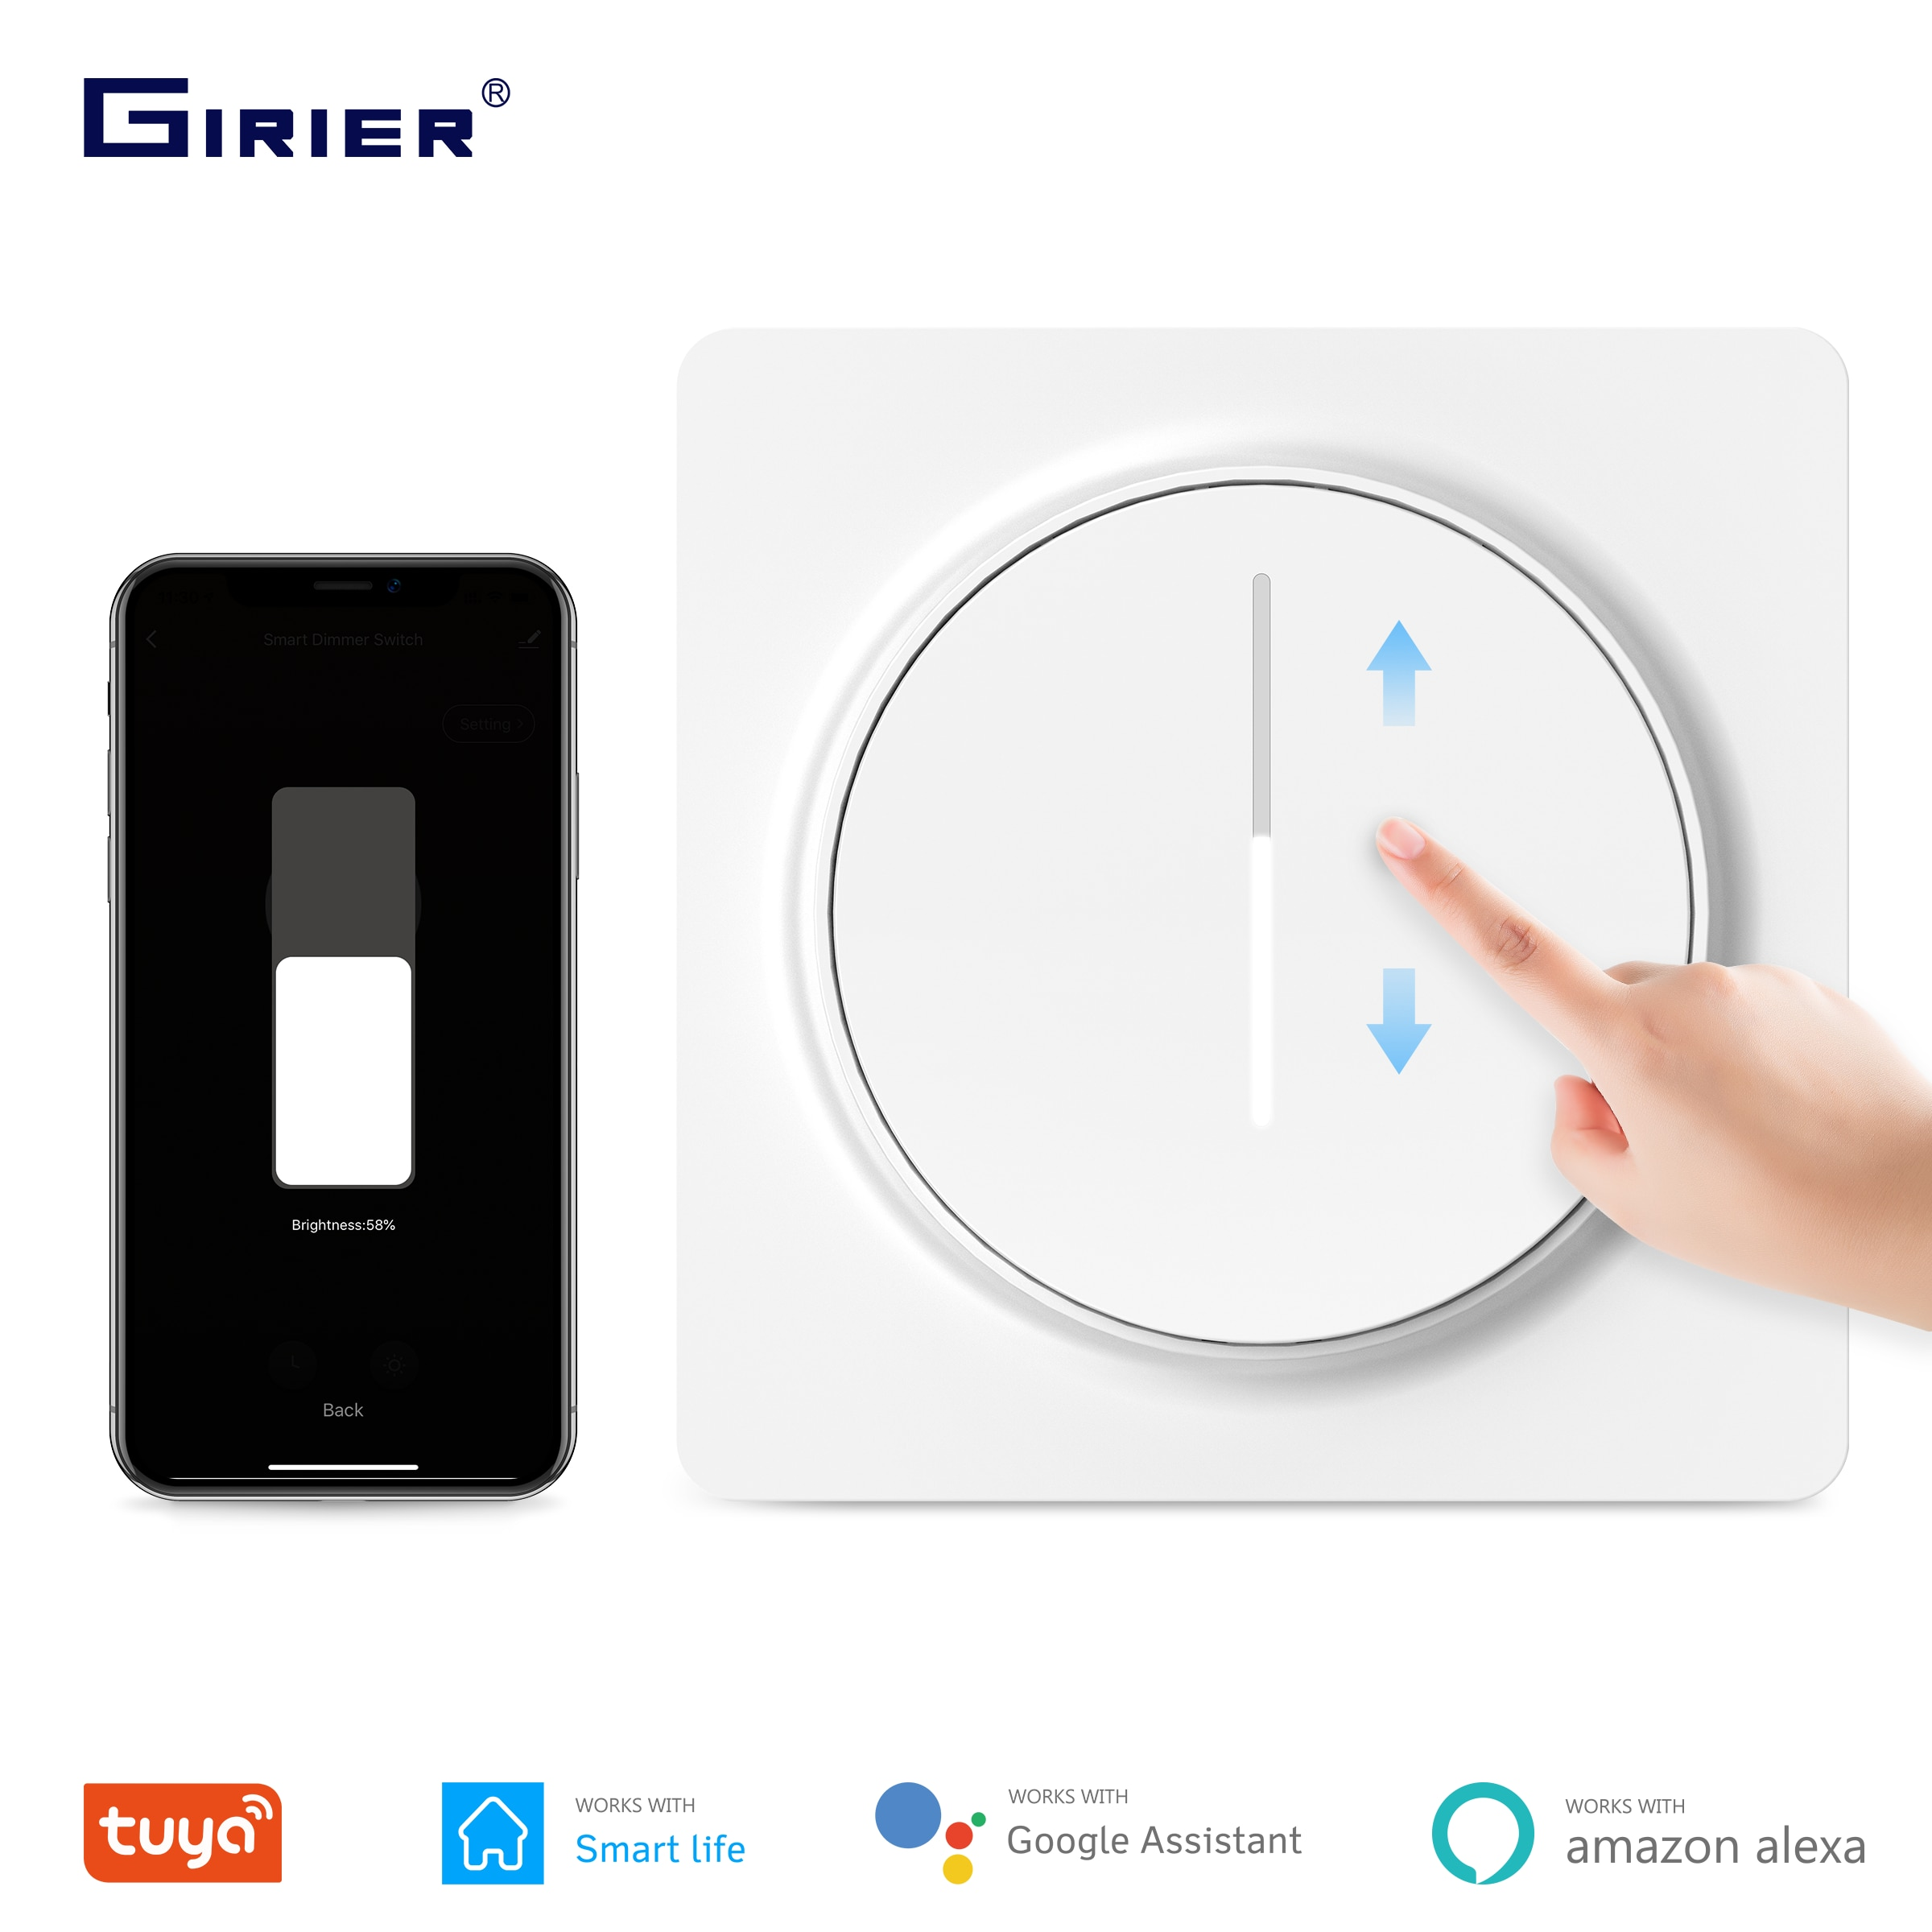 Tuya-مفتاح باهتة ذكي wi-fi ، لوحة لمس قابلة للتعديل ، EU 100-240V ، متوافق مع Alexa و Google Home ، لا يوجد محور مطلوب